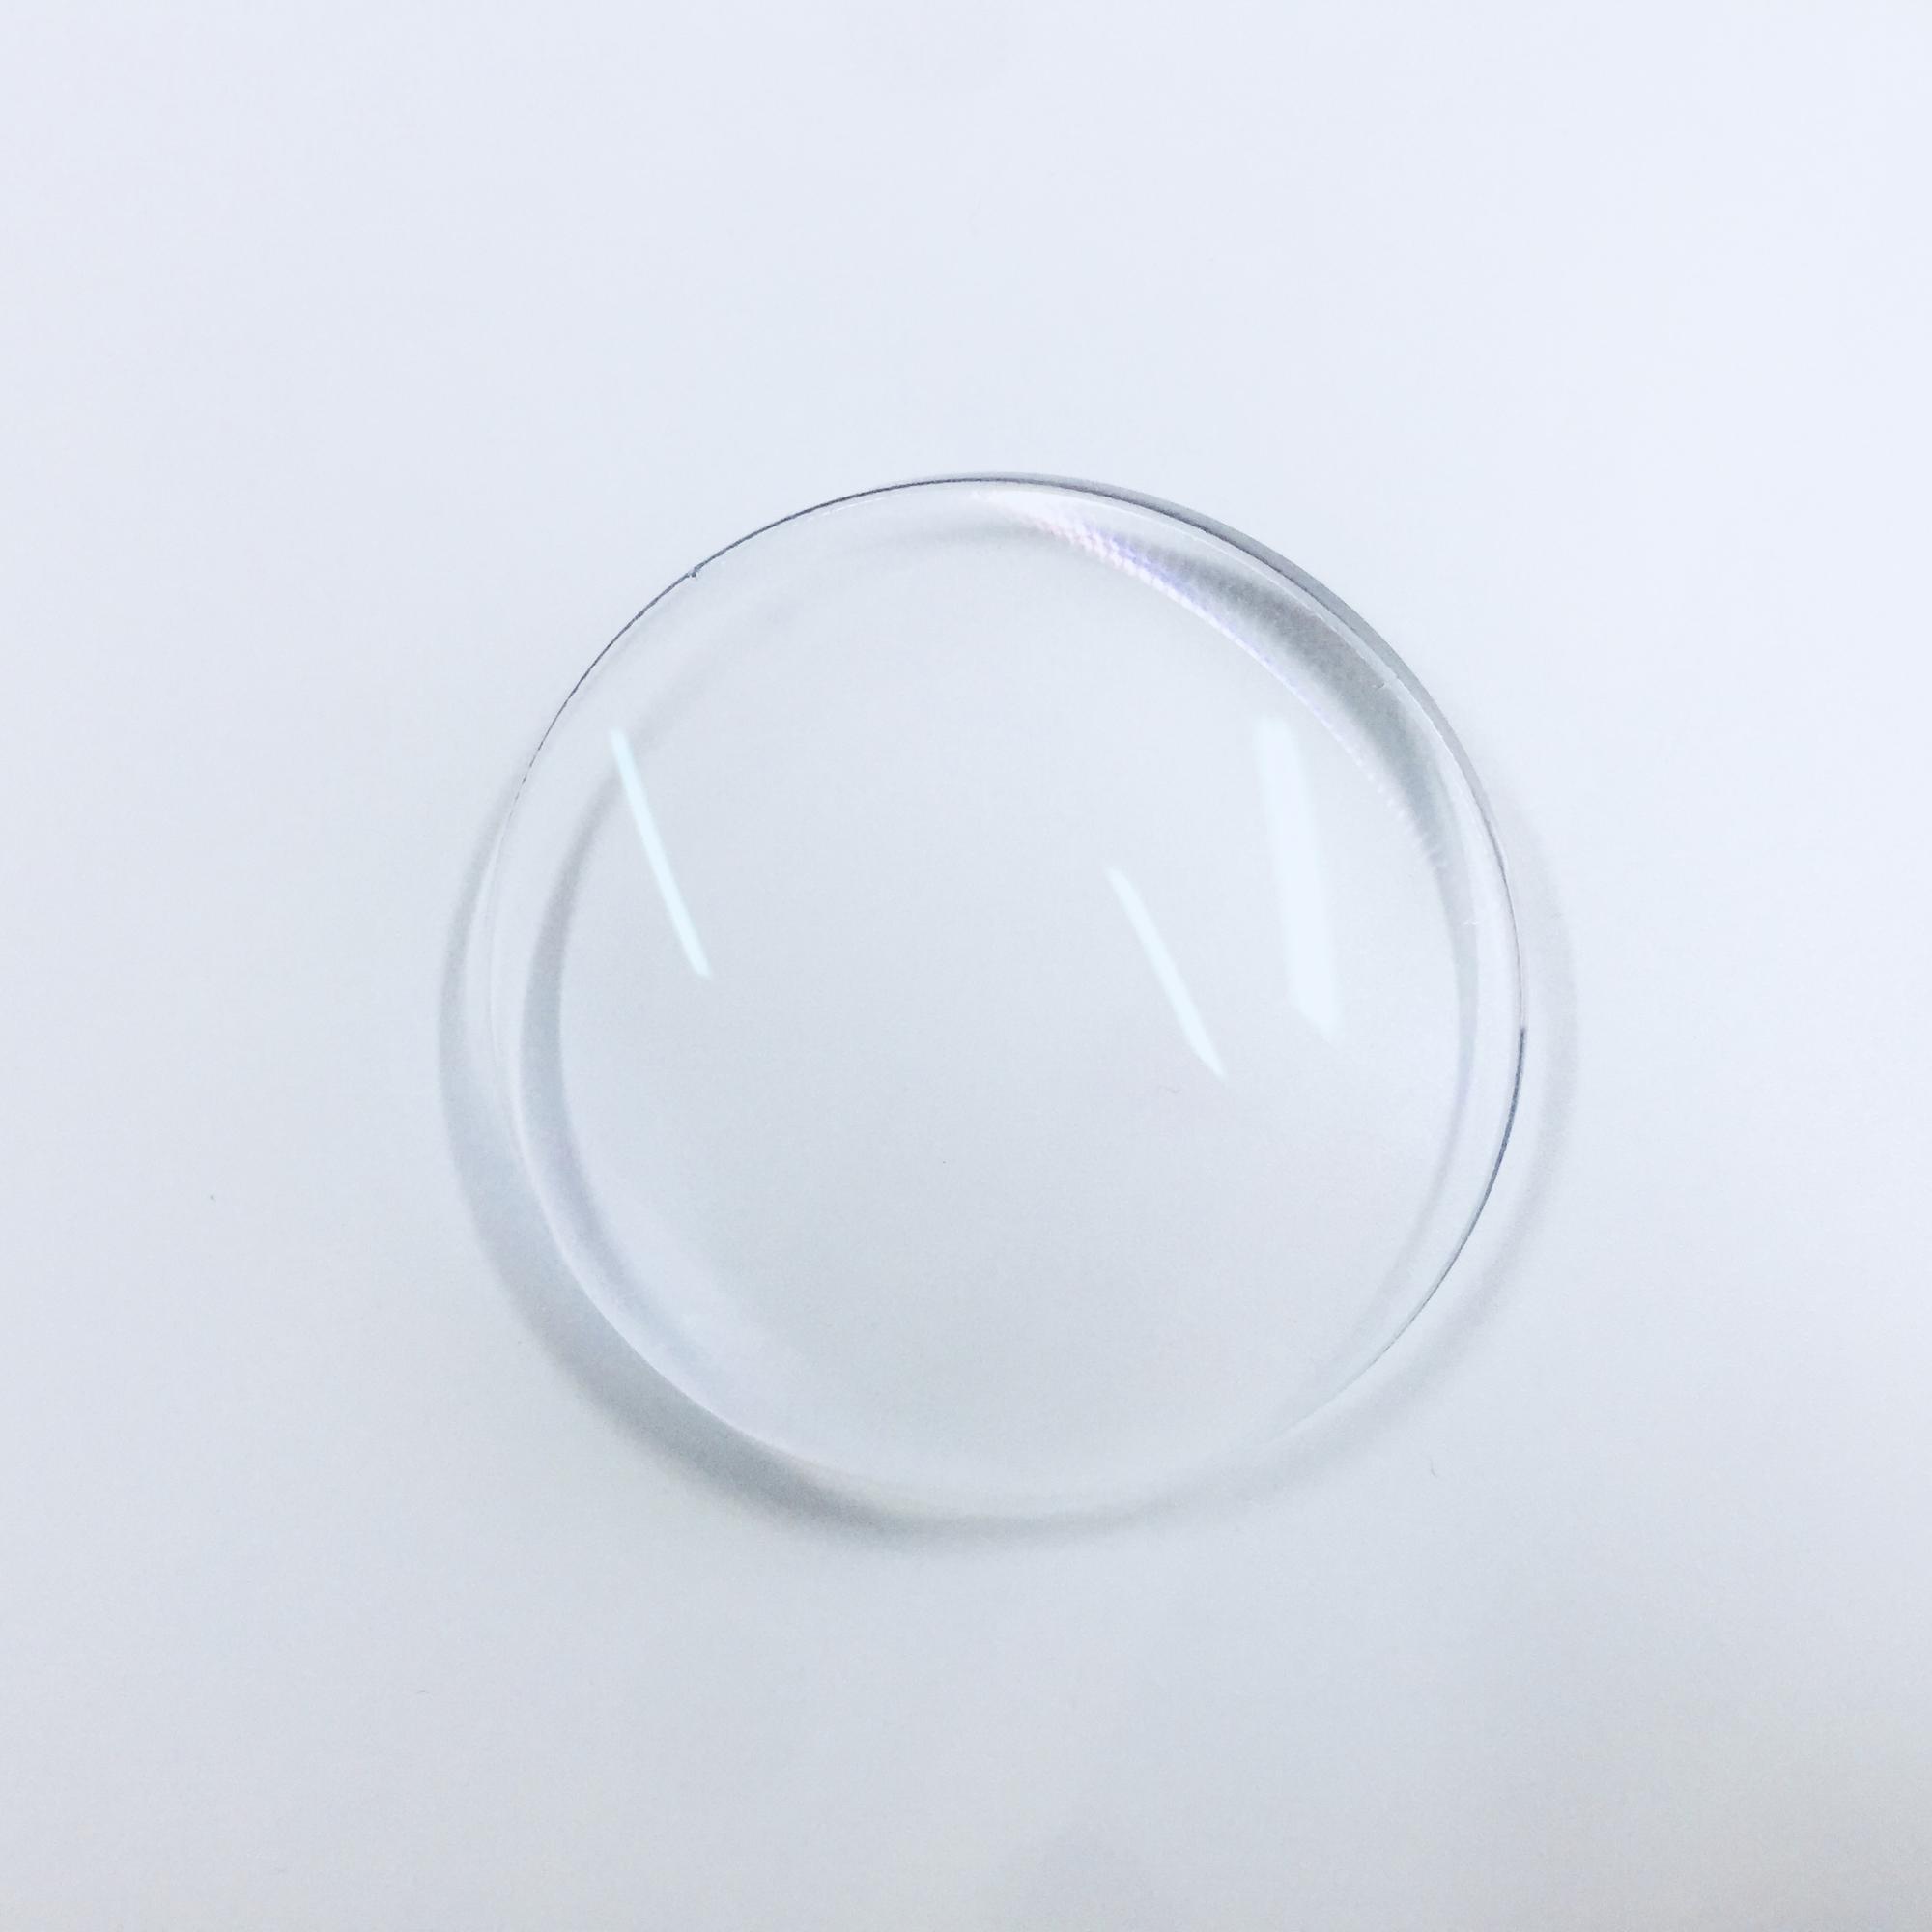 Danyang wholesale eyeglass lens optical CR39 1.49 1.56 1.61 1.67 1.74 UC/HC/HMC/SHMC single vision ophthalmic lenses